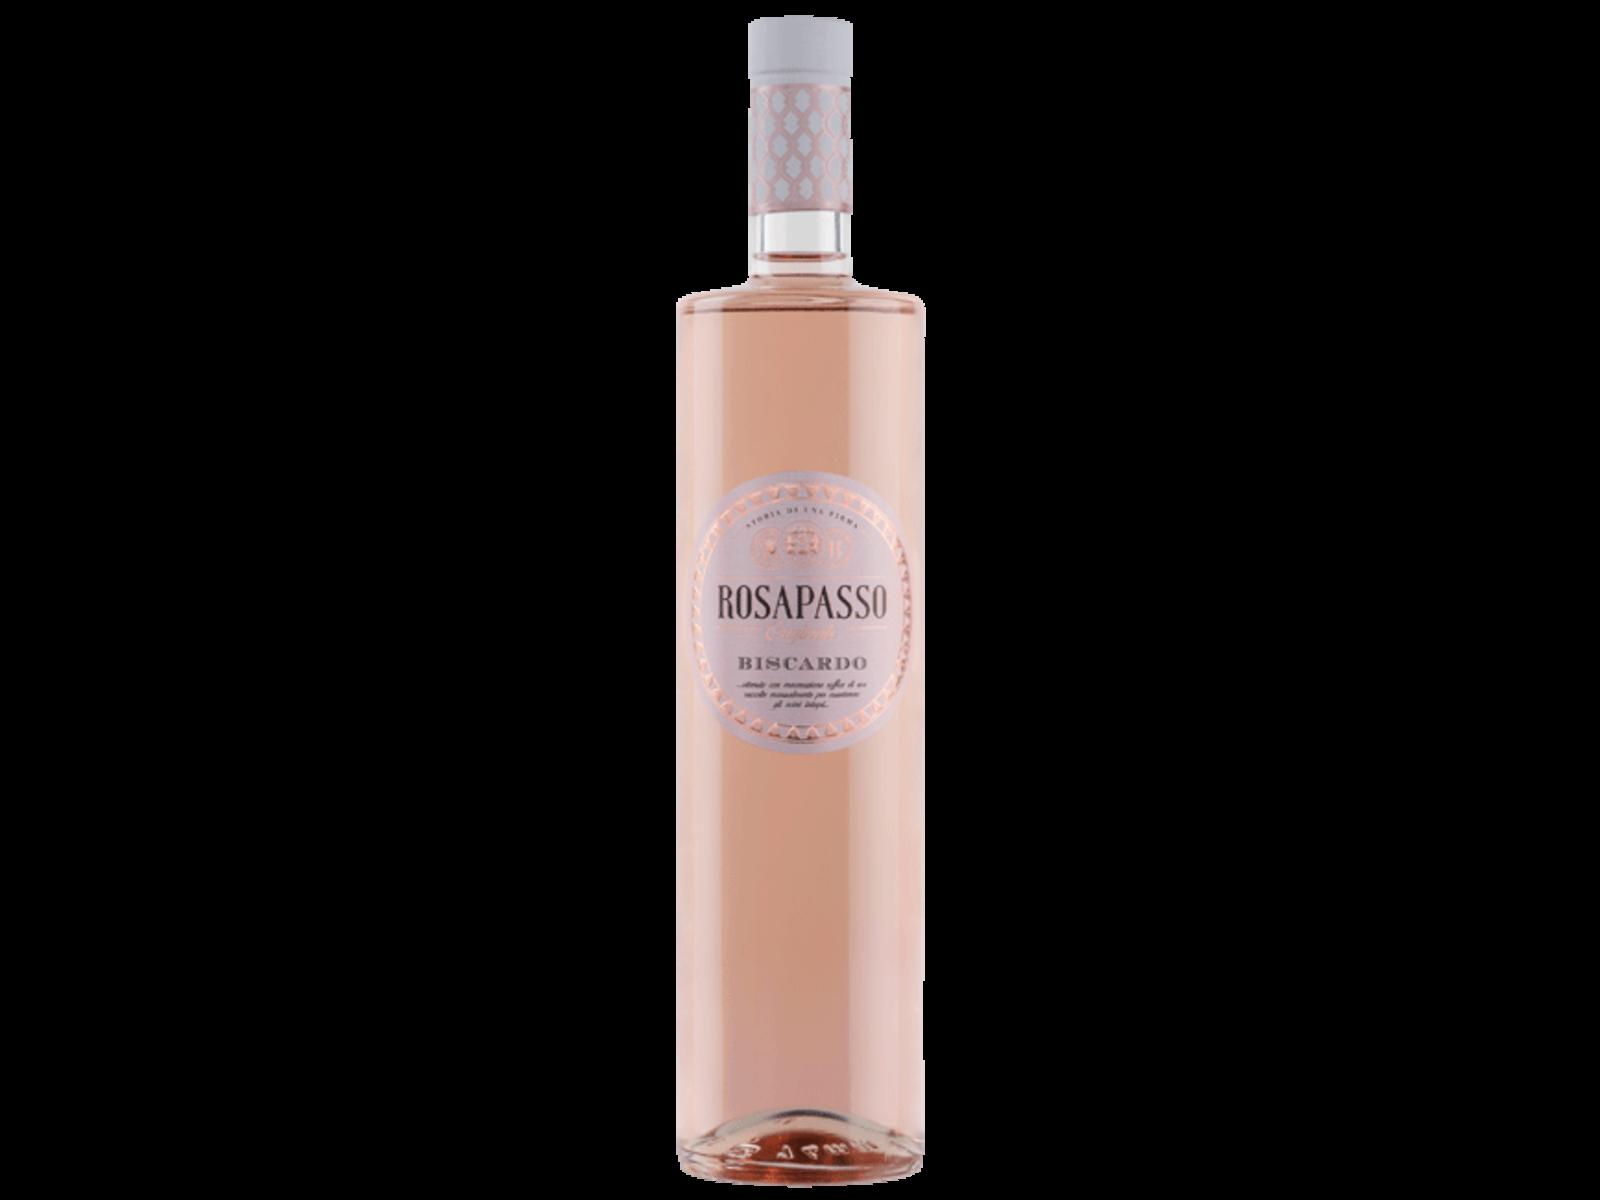 Biscardo Vini Rosapasso / Pinot Nero Rosato